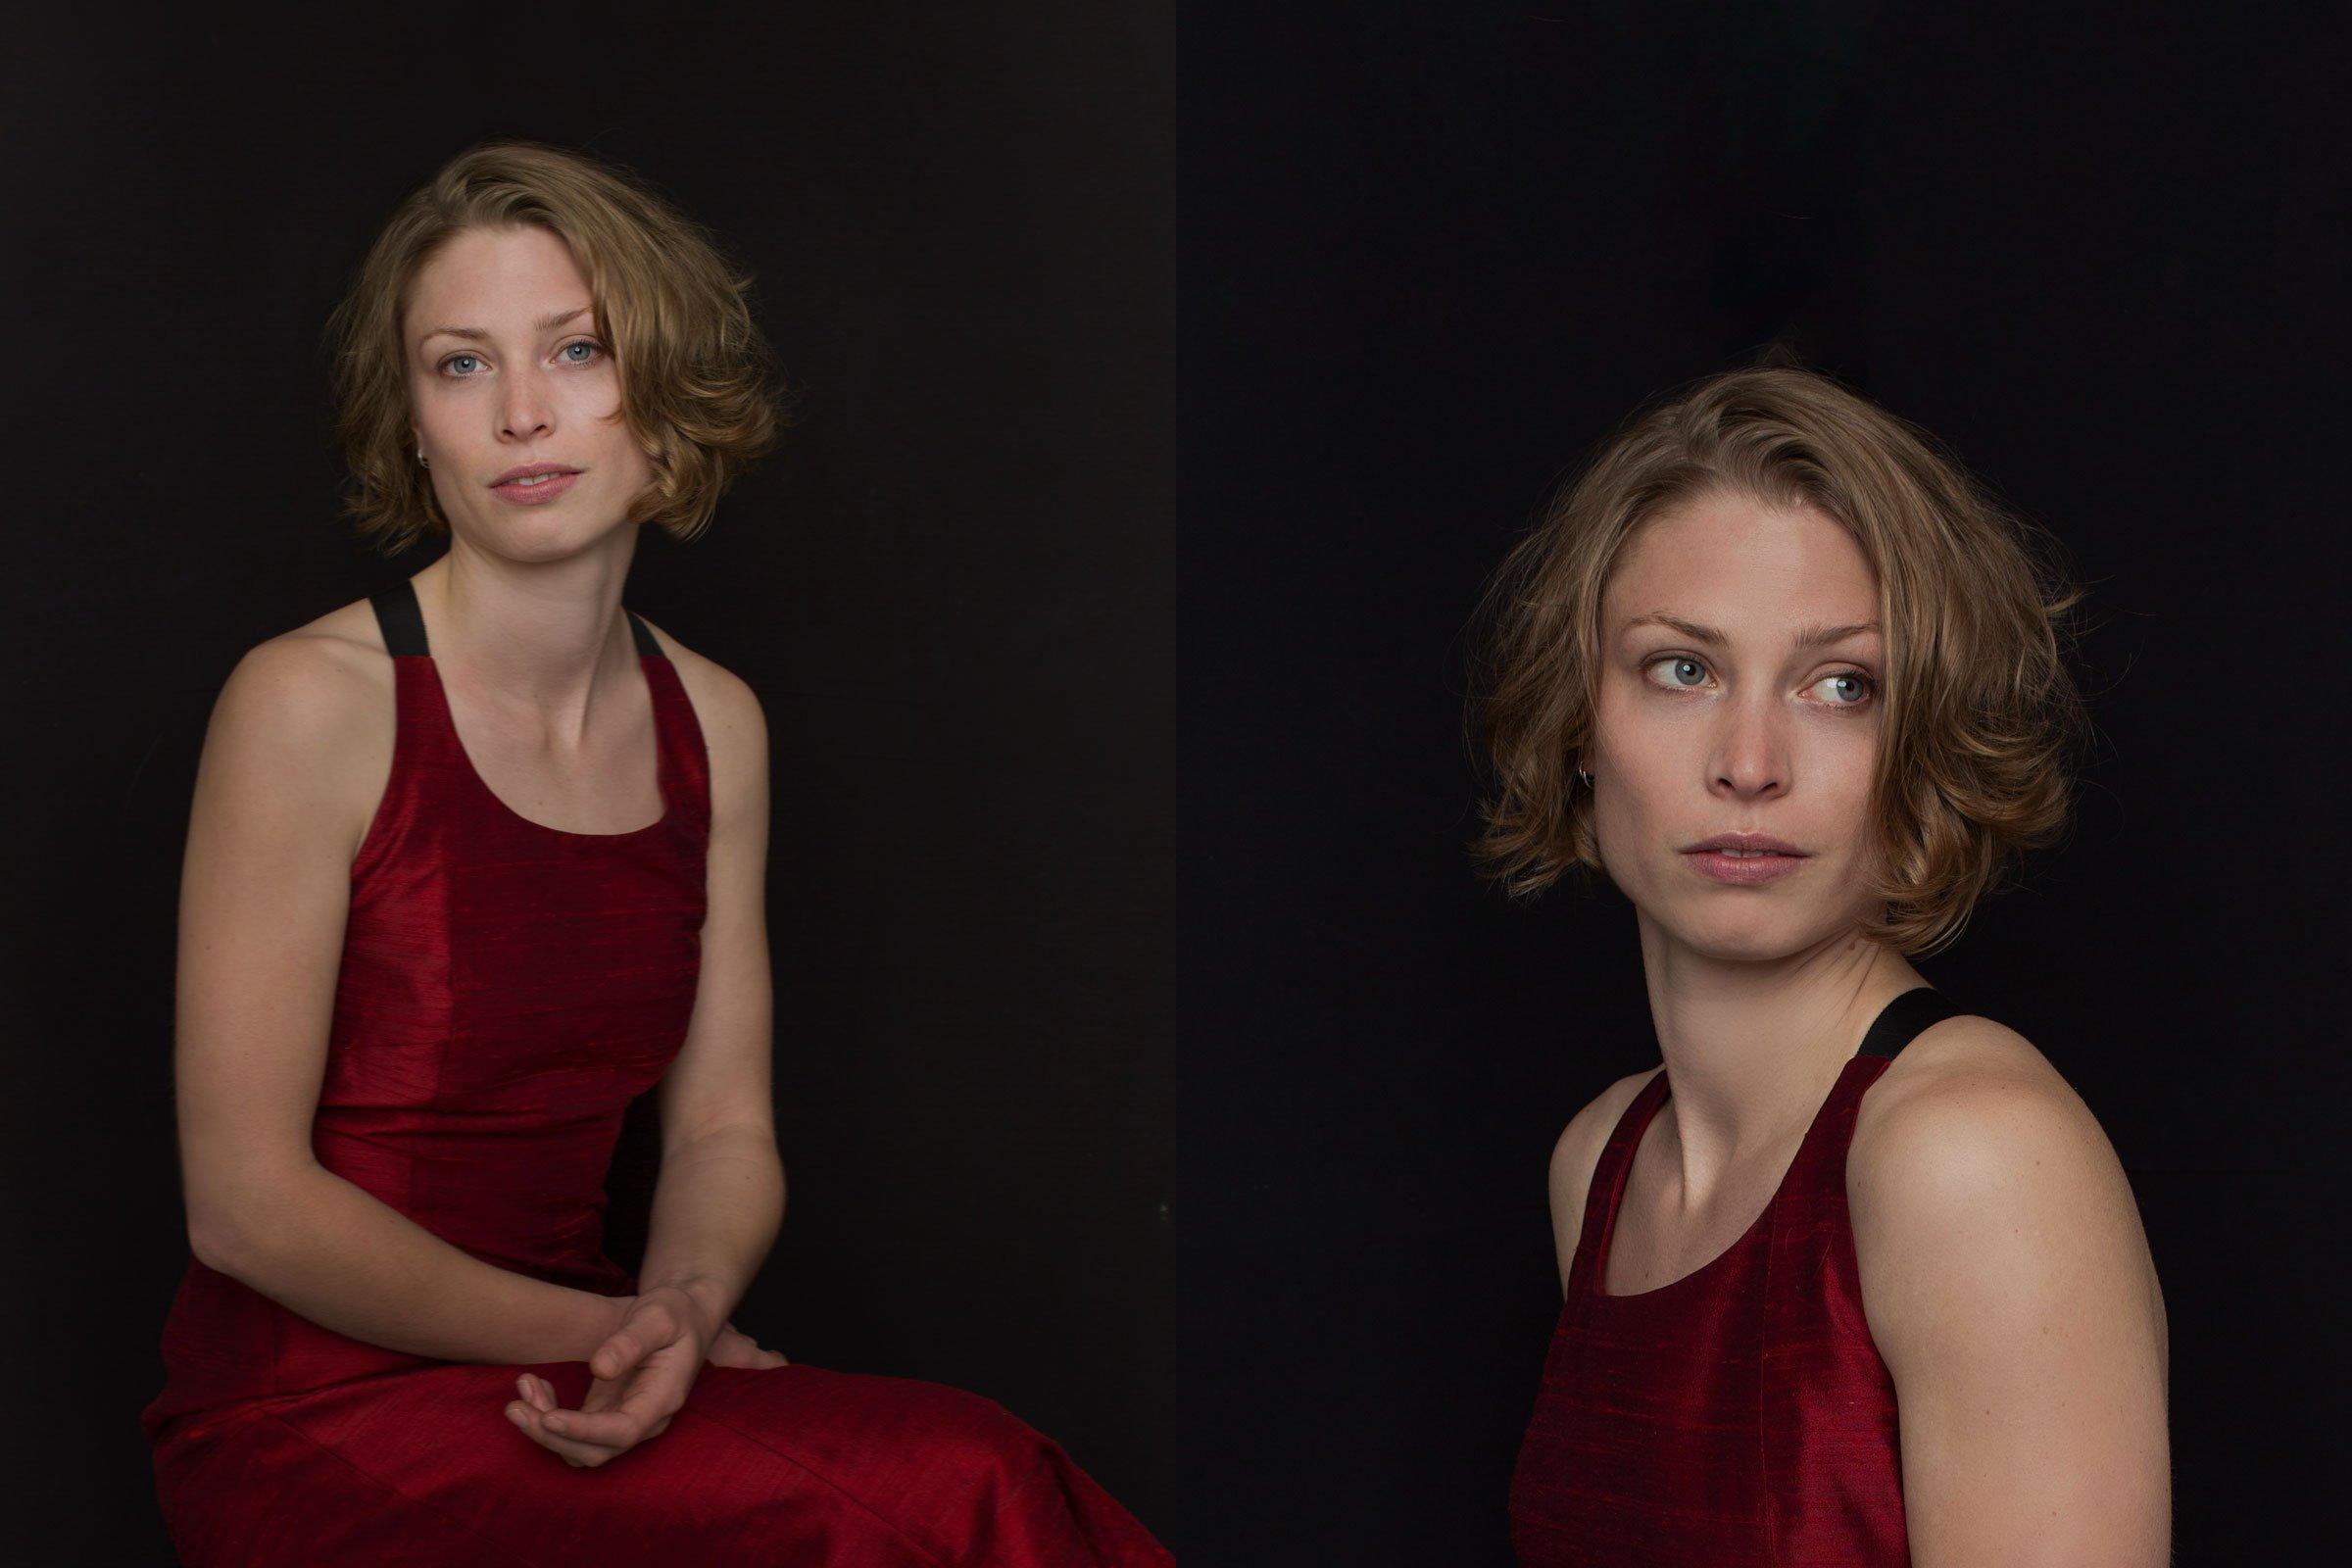 Contemporay-portrait-young-woman-evening-dress